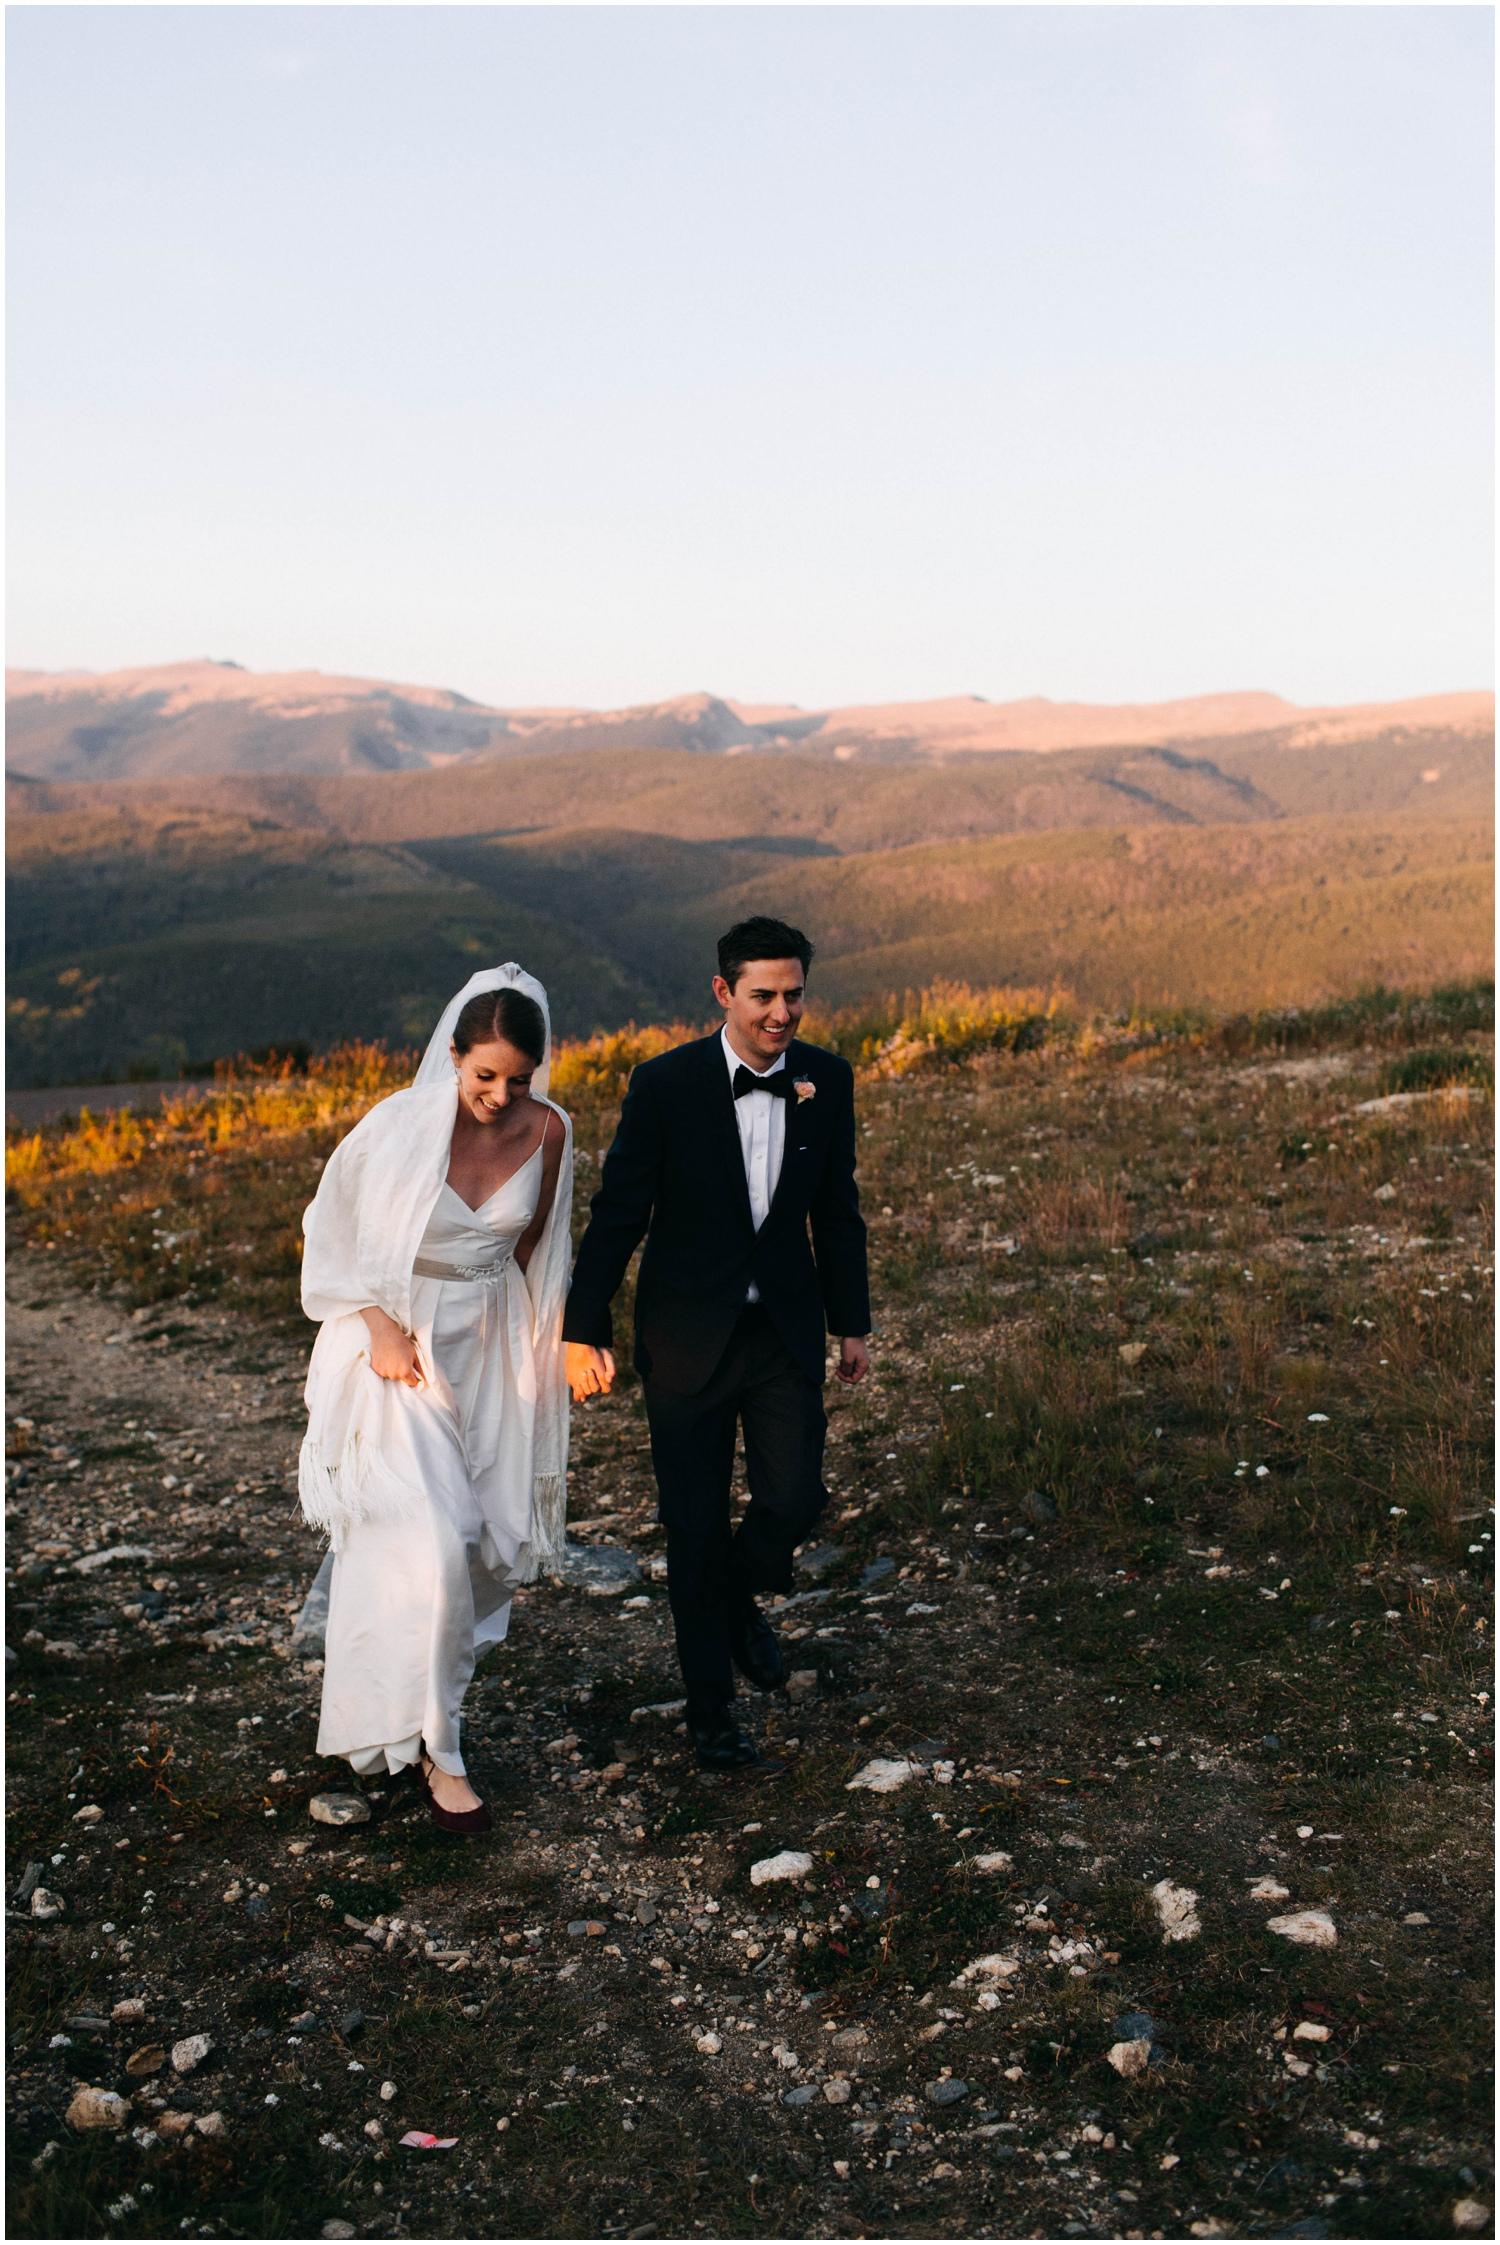 NadegeandJoe_elegant_winter_park_wedding_lodge_at_sunspot_mountain_taylor_powers_0247.jpg